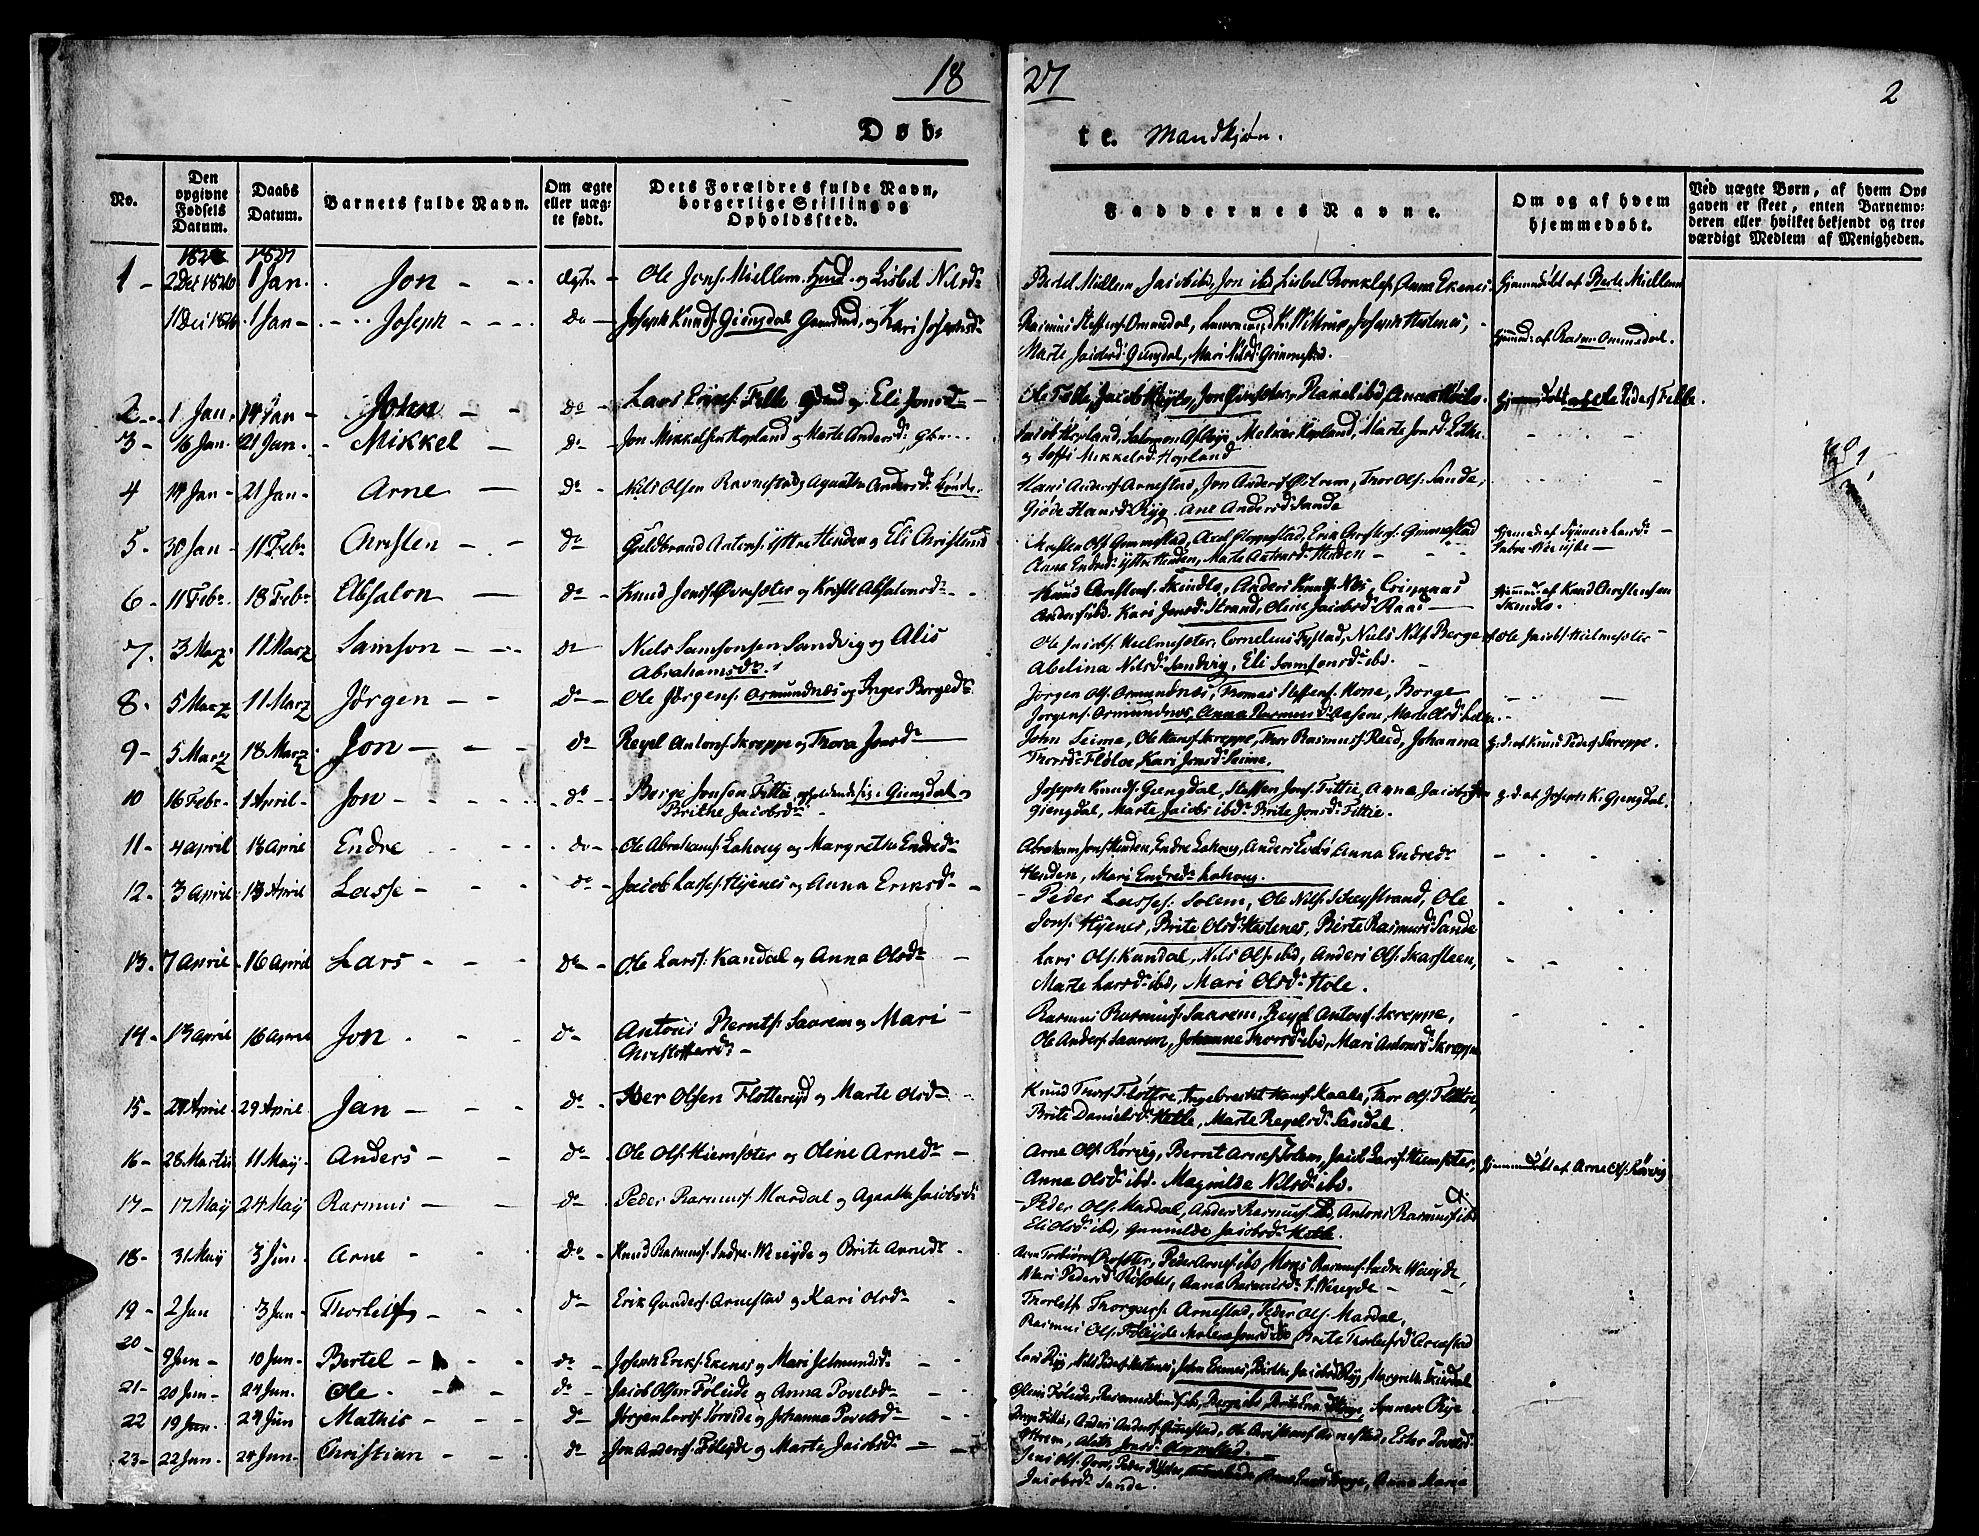 SAB, Gloppen Sokneprestembete, H/Haa/Haaa/L0007: Ministerialbok nr. A 7, 1827-1837, s. 2